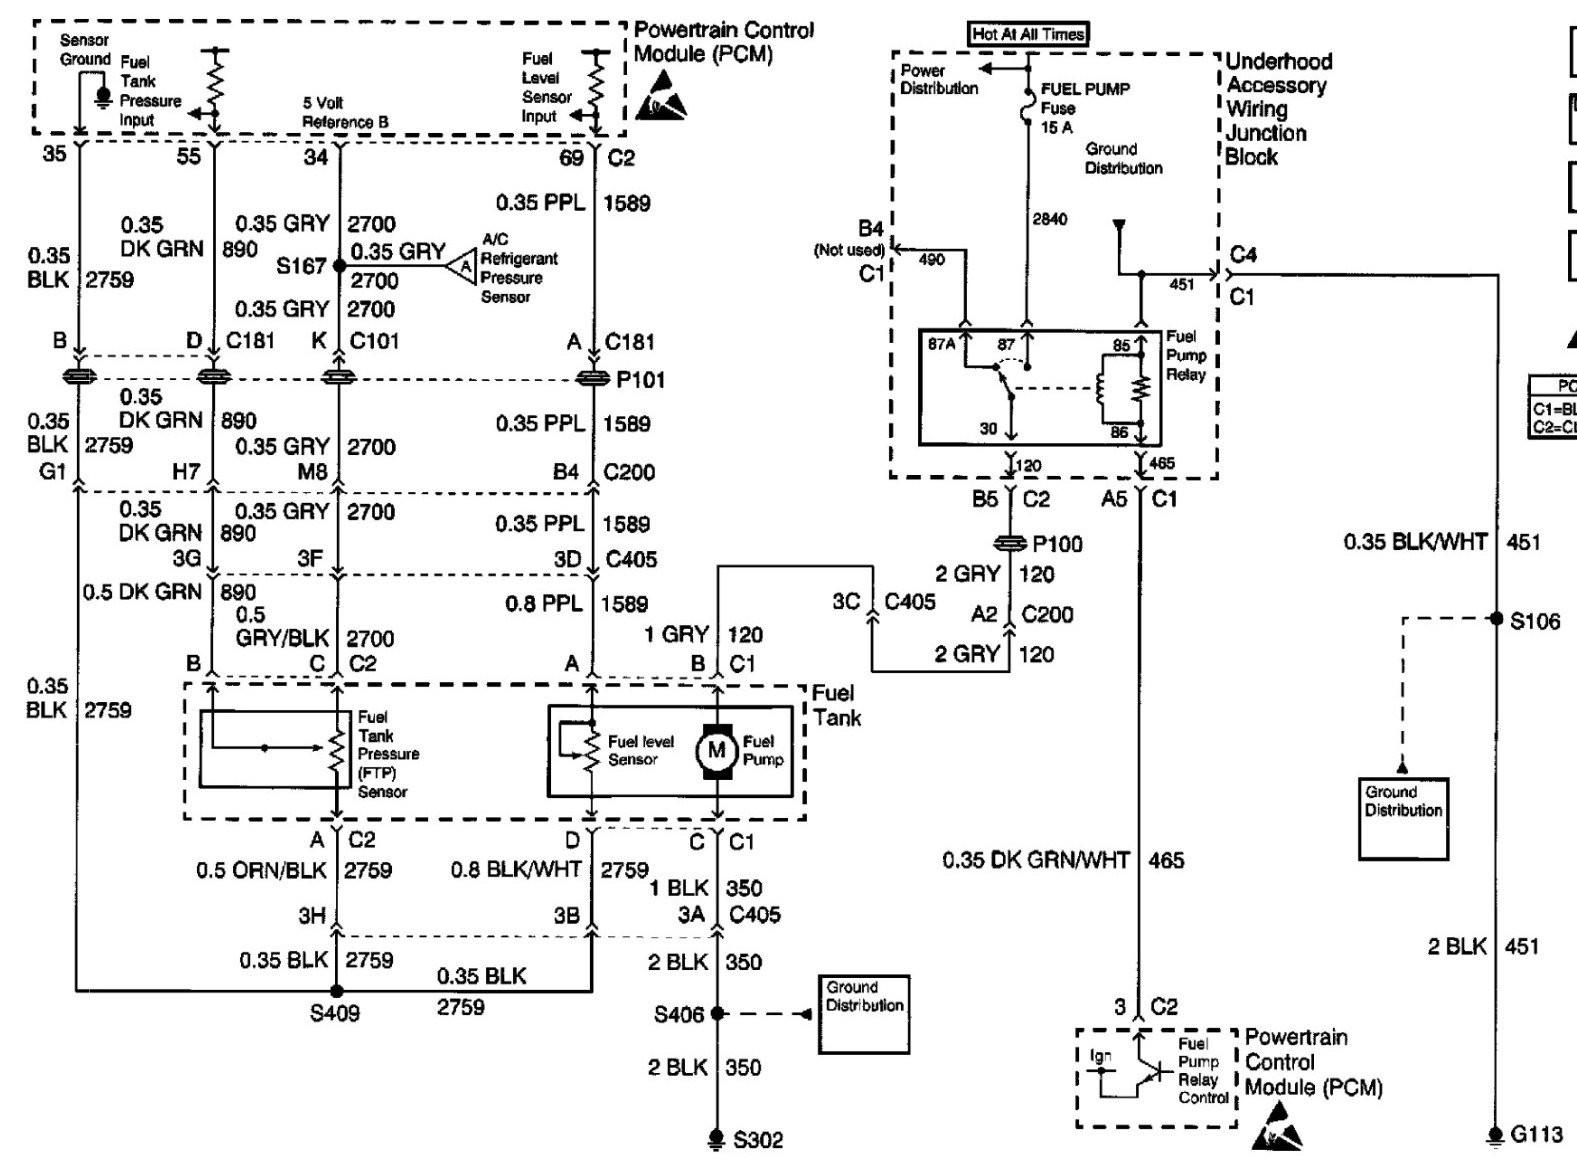 [DIAGRAM_1CA]  TH_3977] Teleflex Fuel Gauge Wiring Diagram Schematic Schematic Wiring | Bosch Fuel Gauge Wiring Diagram Schematic |  | Wedab Wigeg Mohammedshrine Librar Wiring 101